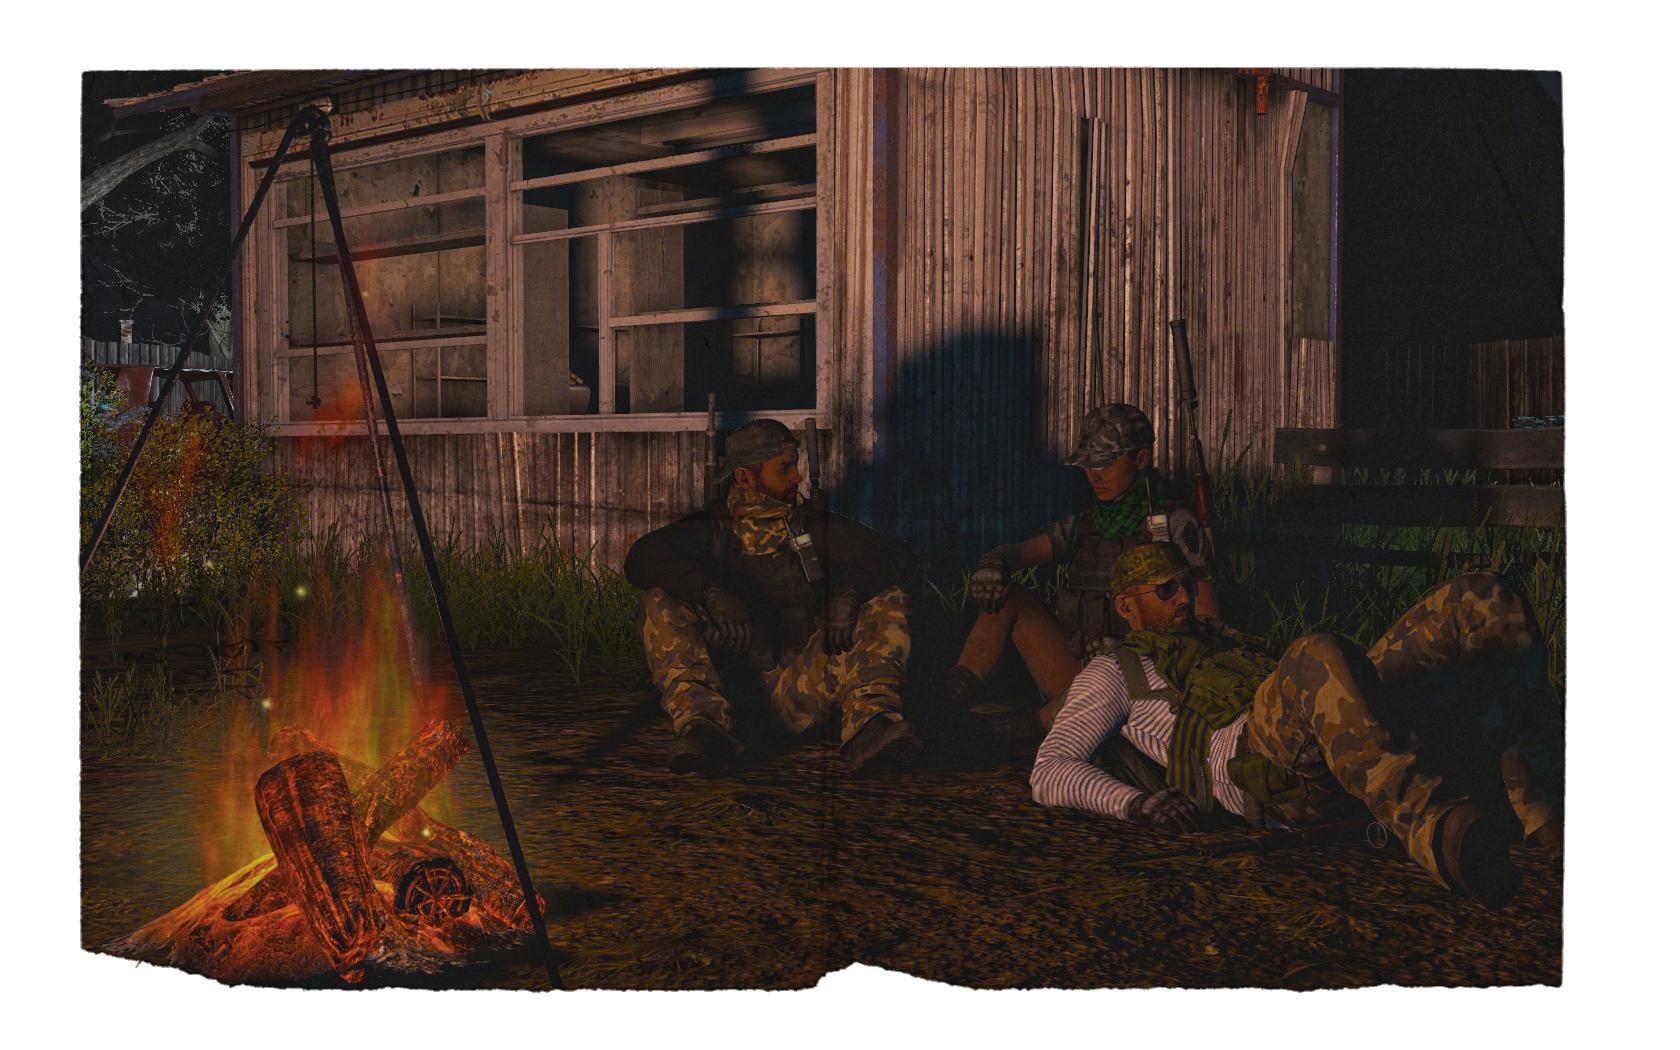 Family_Campfire_edit.png.aa497b1e1fff2c9f23470077731b0085.png